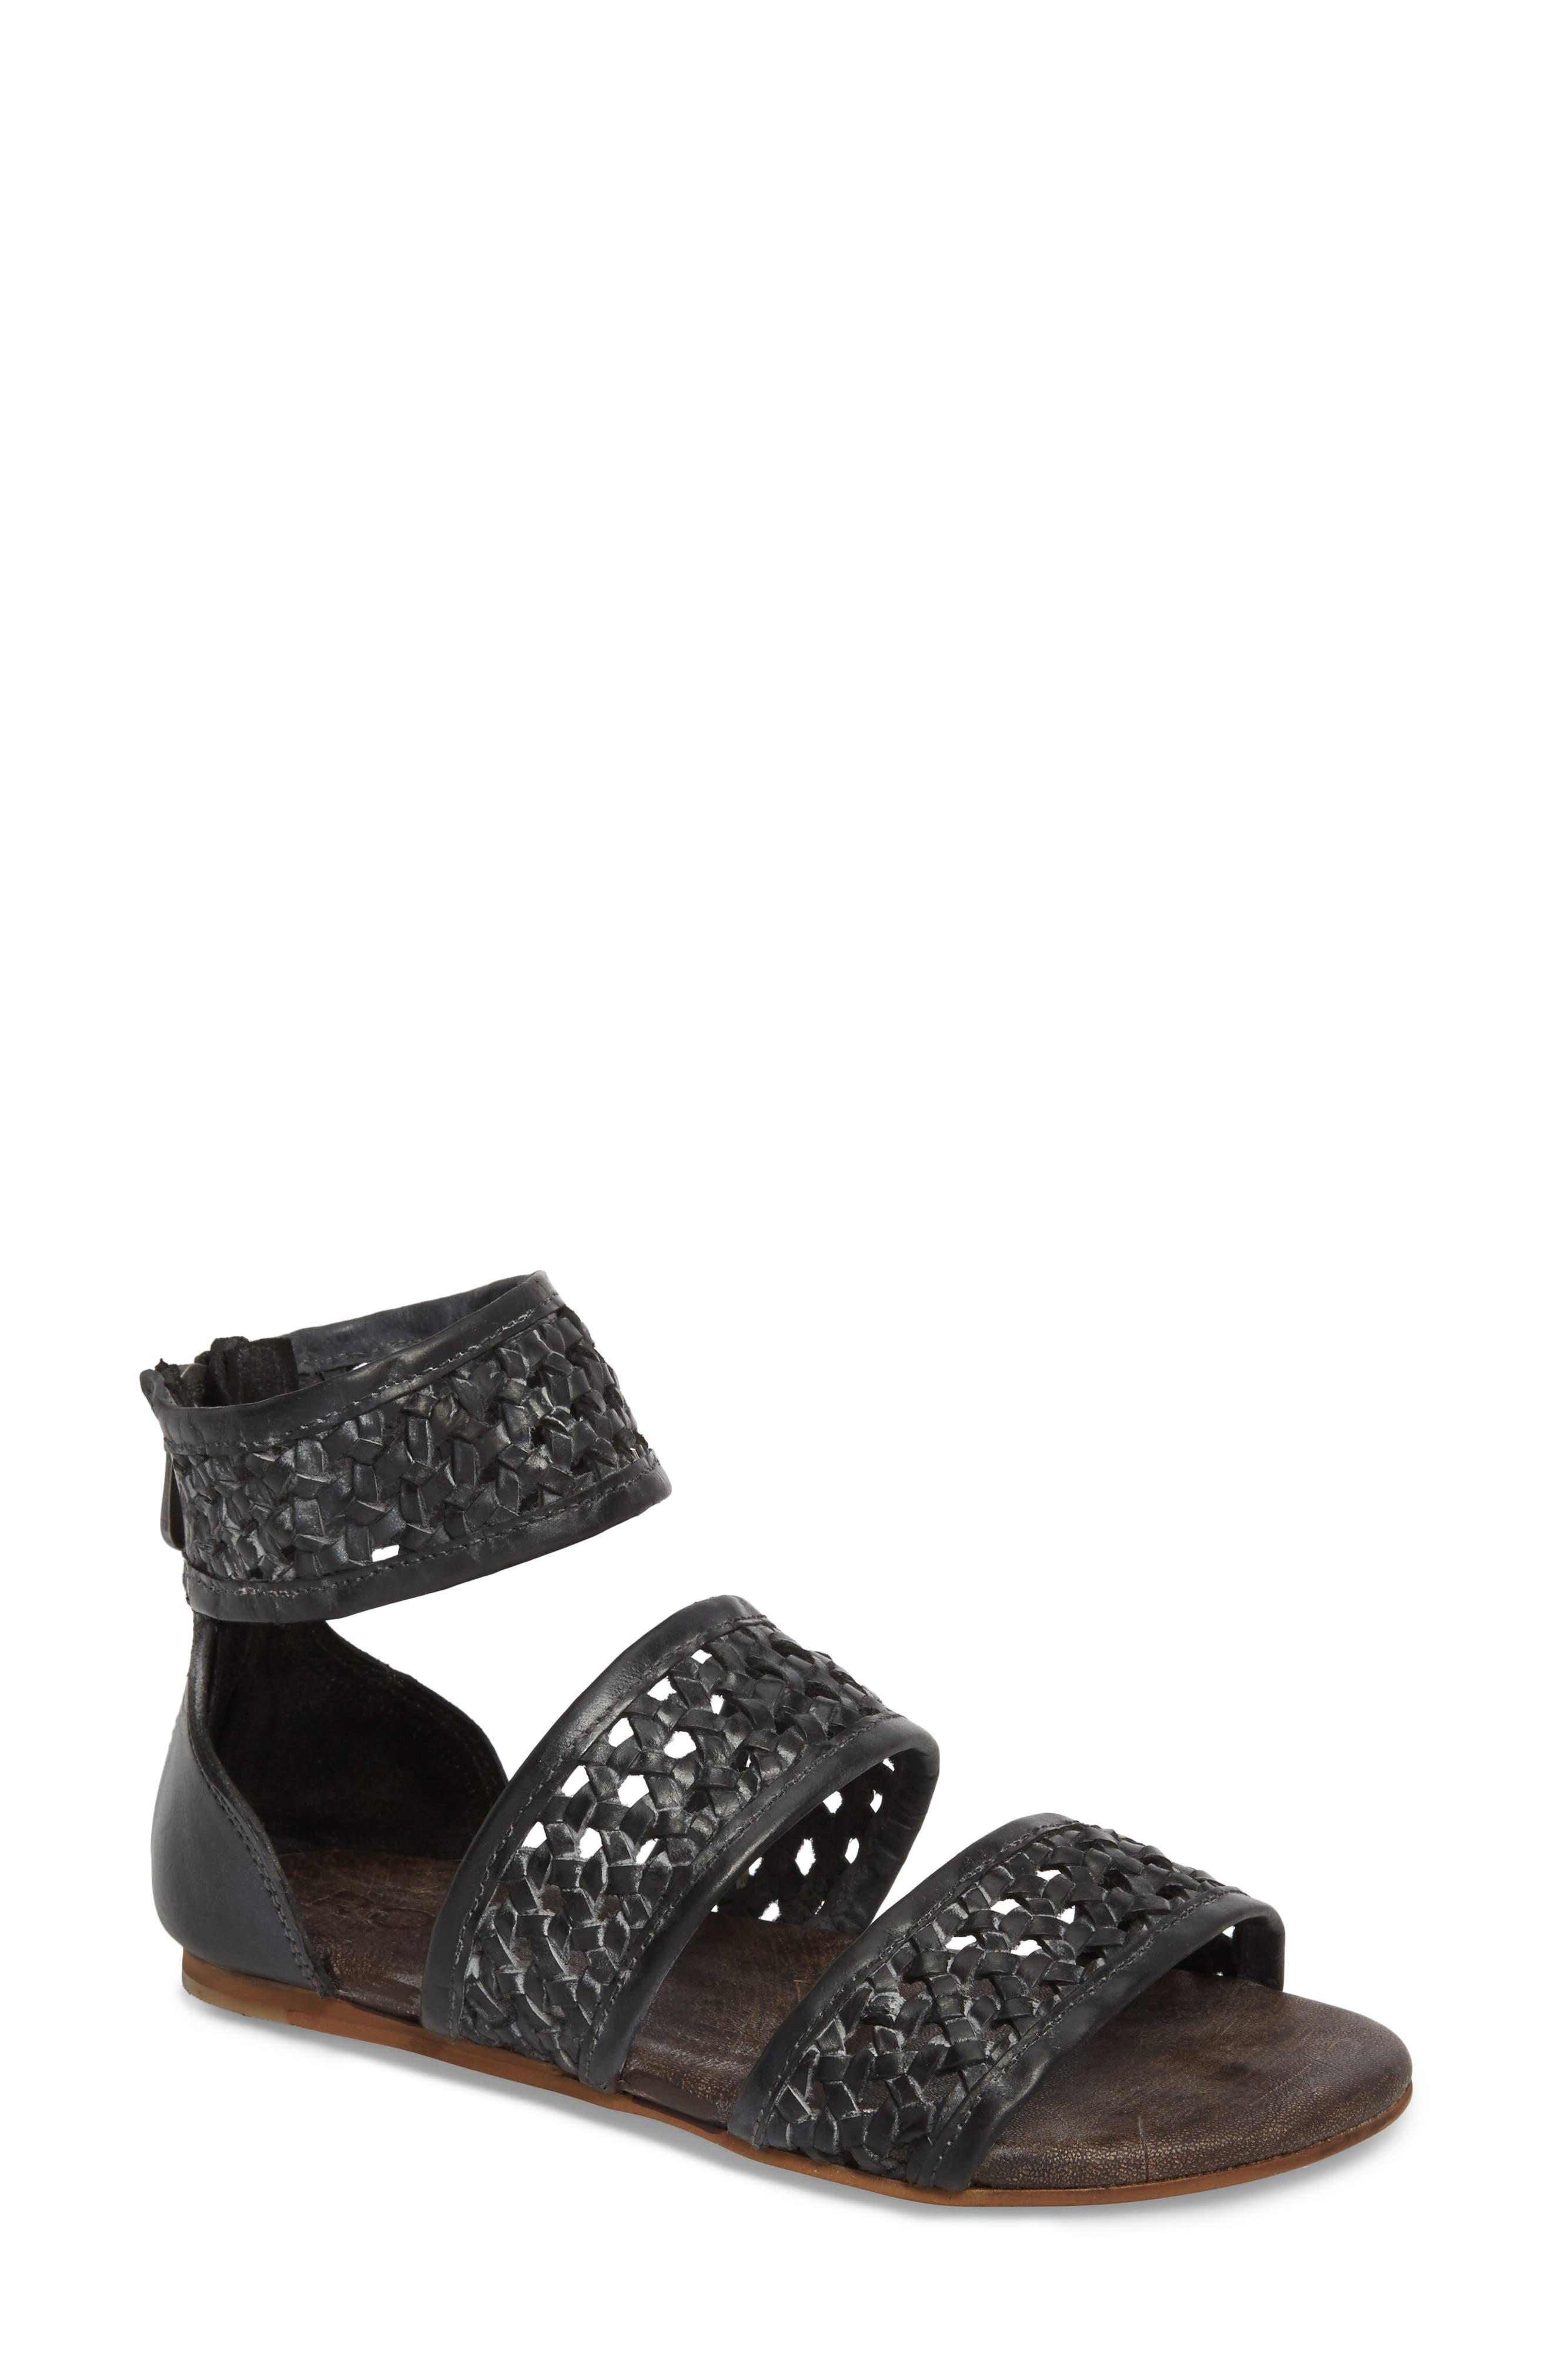 Clio Woven Ankle Cuff Sandal,                         Main,                         color, BLACK